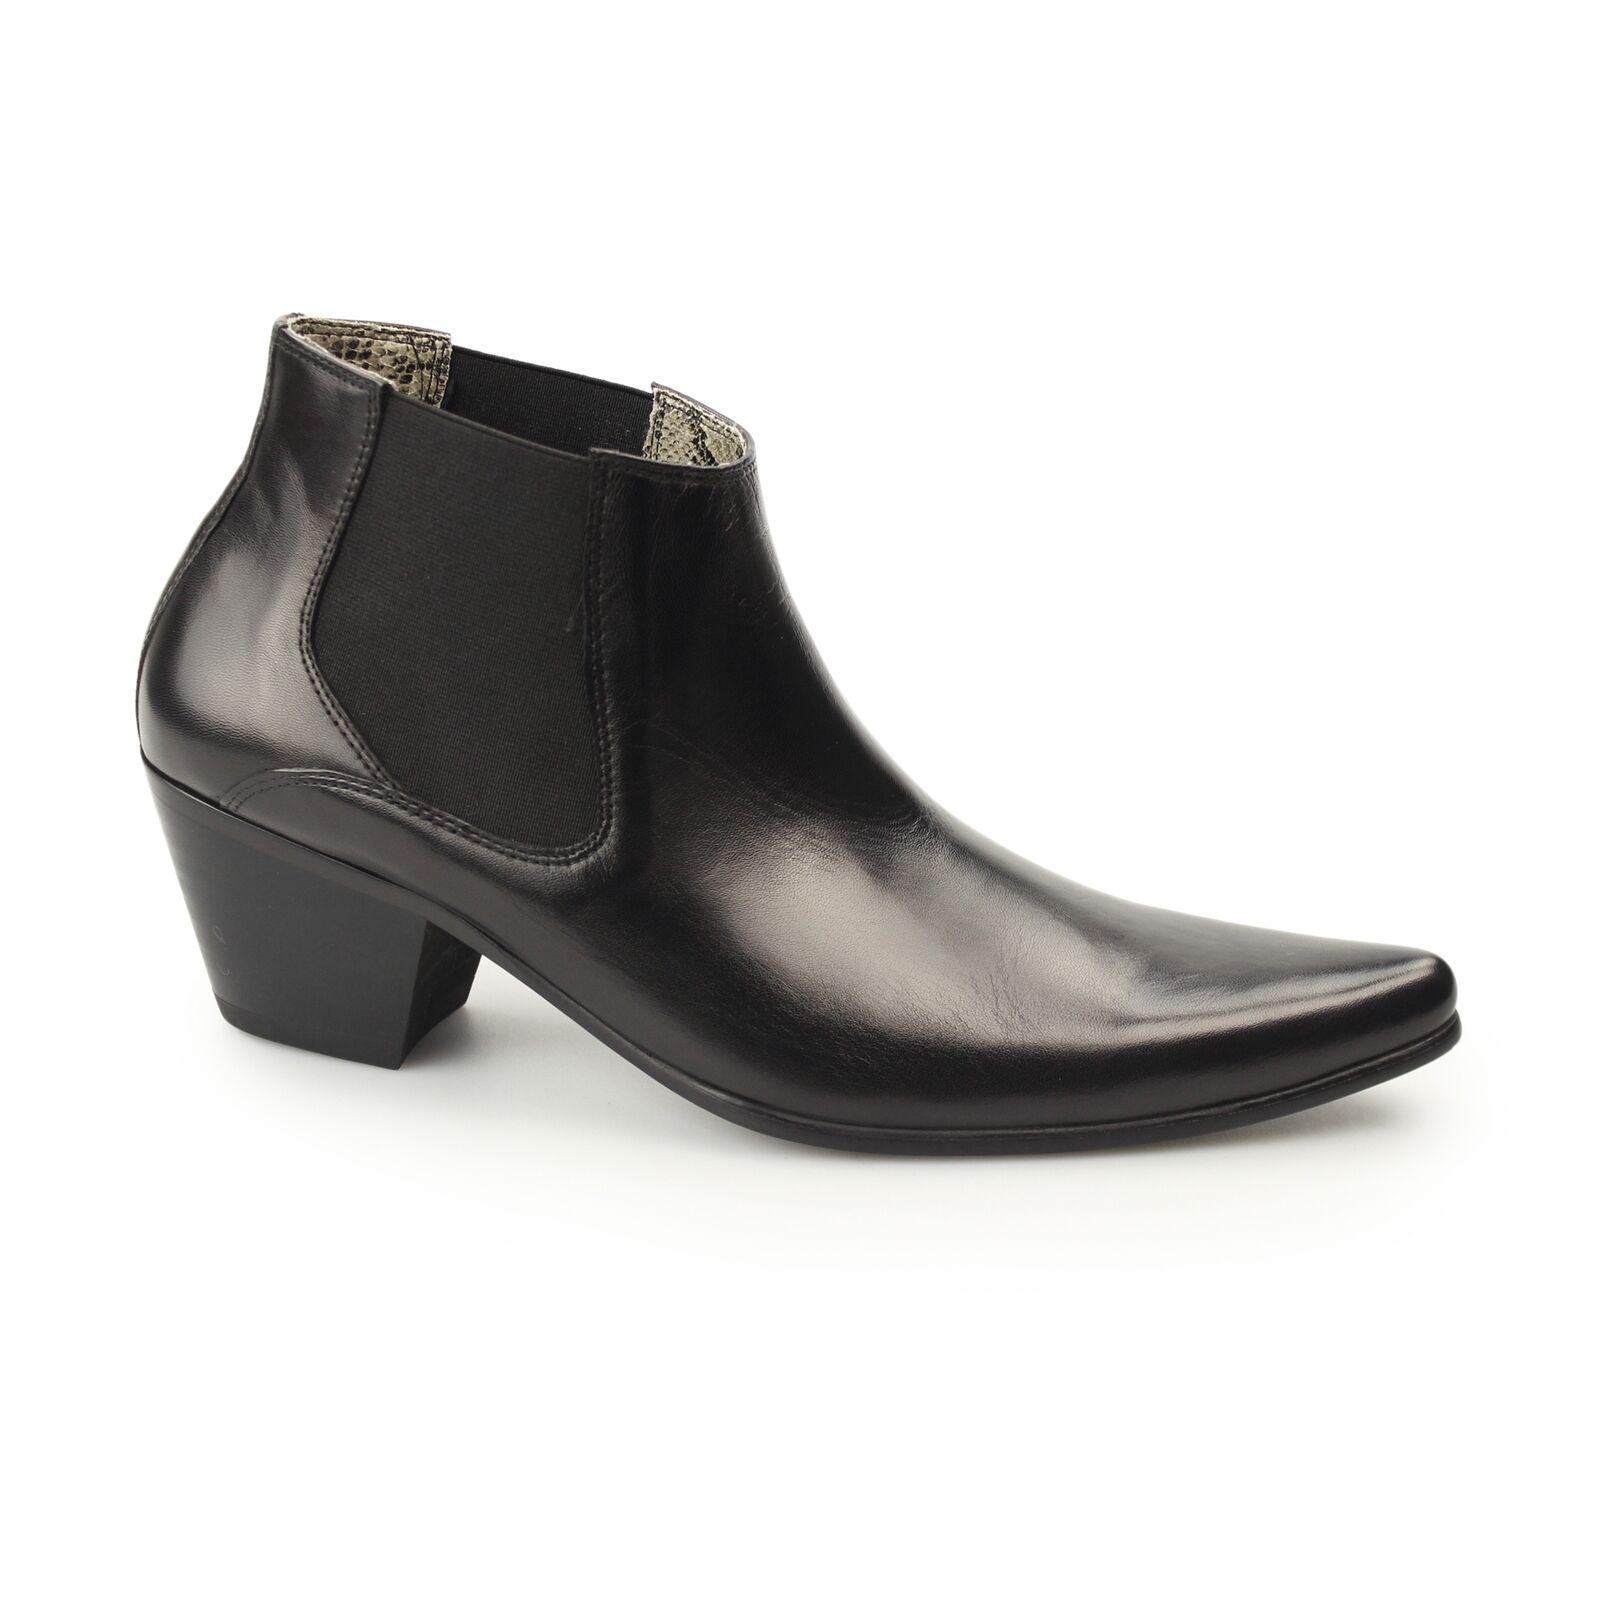 Club Cubano McCARTNEY Mens Leather Winklepicker Cuban Heel Spanish Boots Black